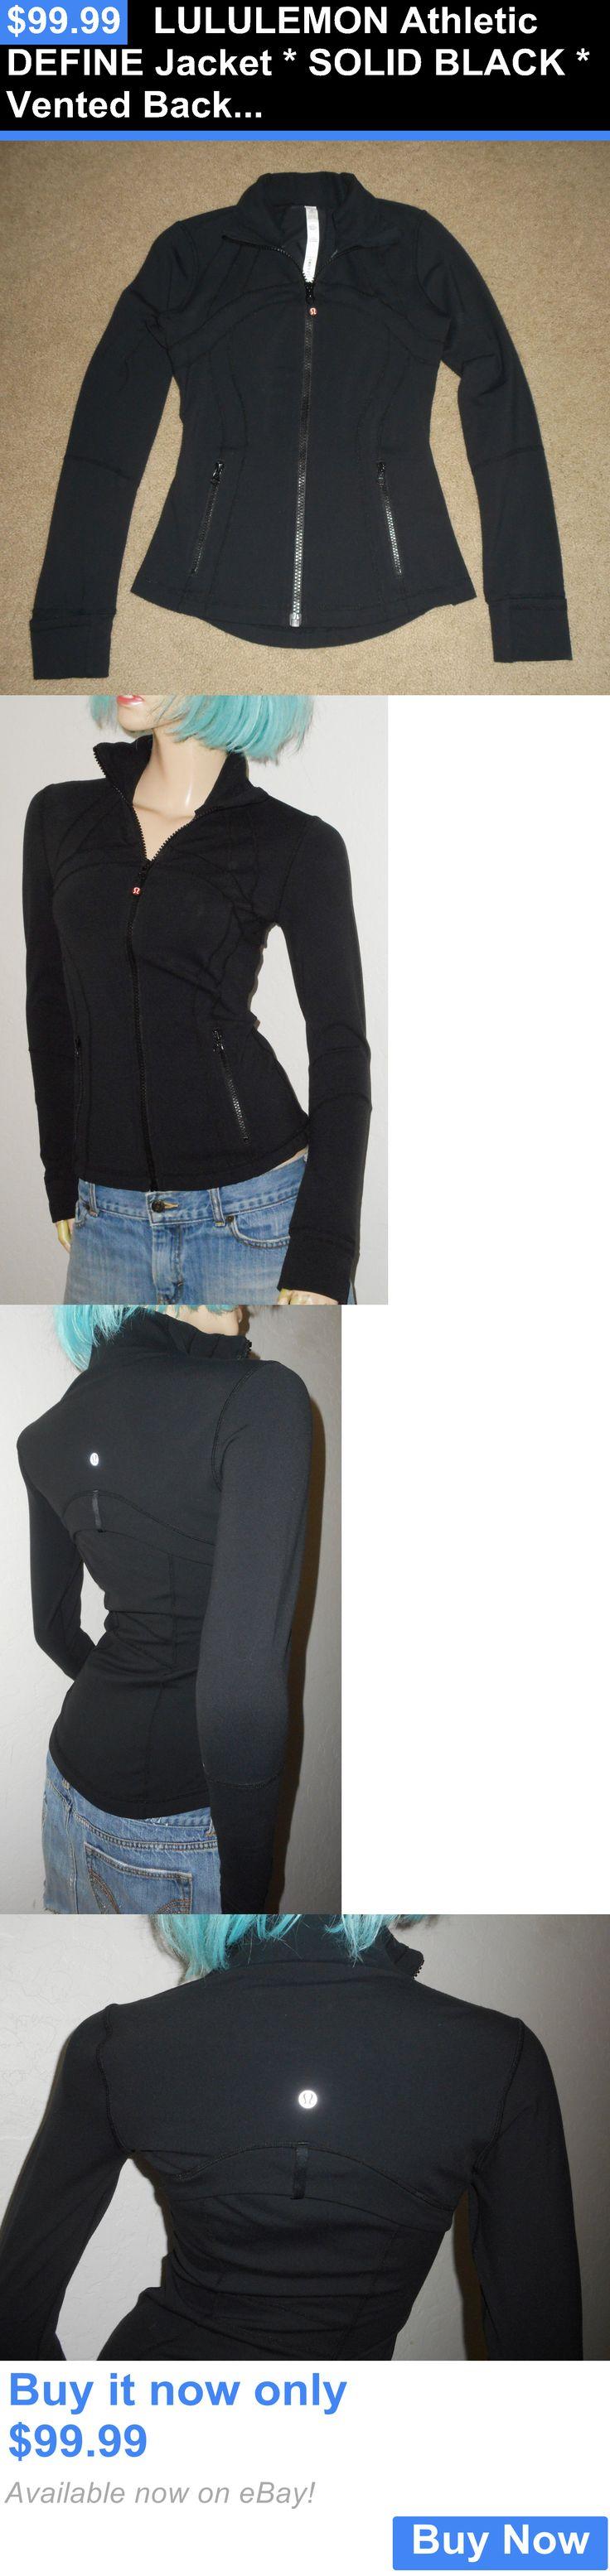 Women Athletics: Lululemon Athletic Define Jacket * Solid Black * Vented Back Yoga Gym New Sz 4 BUY IT NOW ONLY: $99.99